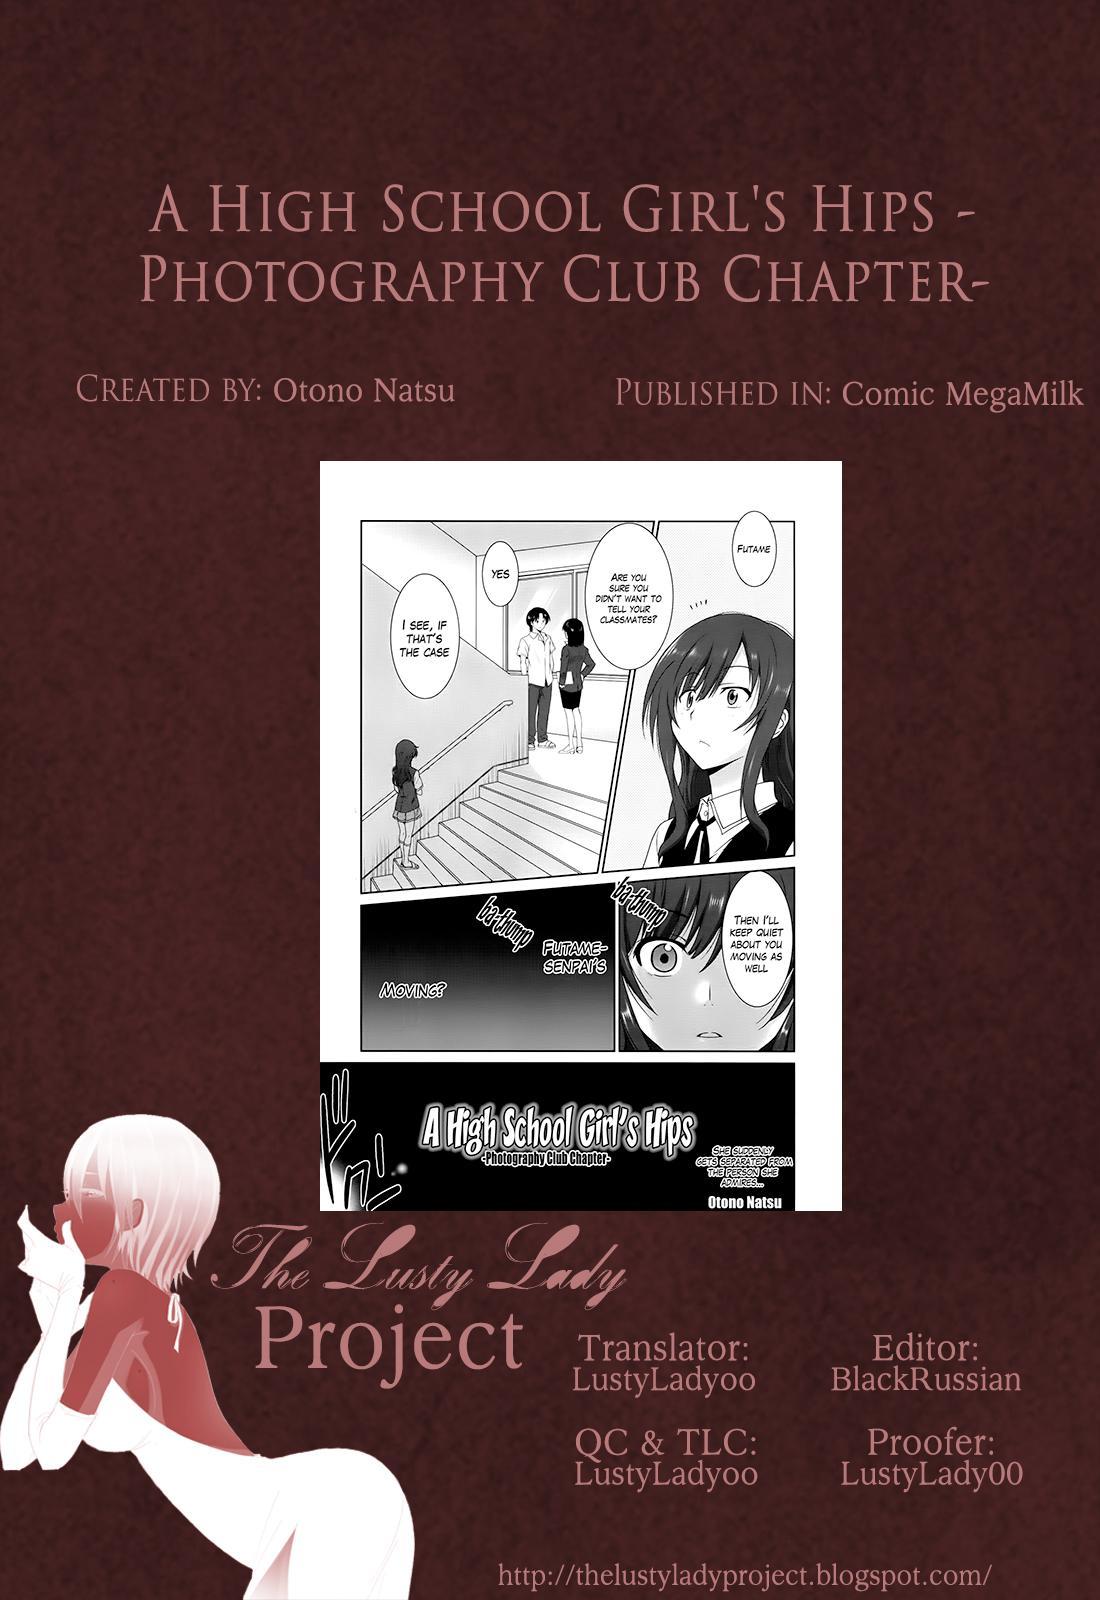 [Otono Natsu] Joshikousei no Koshitsuki -Sasshin-bu Hen-   A High School Girl's Hips - Photography Club Chapter (COMIC Megamilk 2012-06) [English] {The Lusty Lady Project} 20